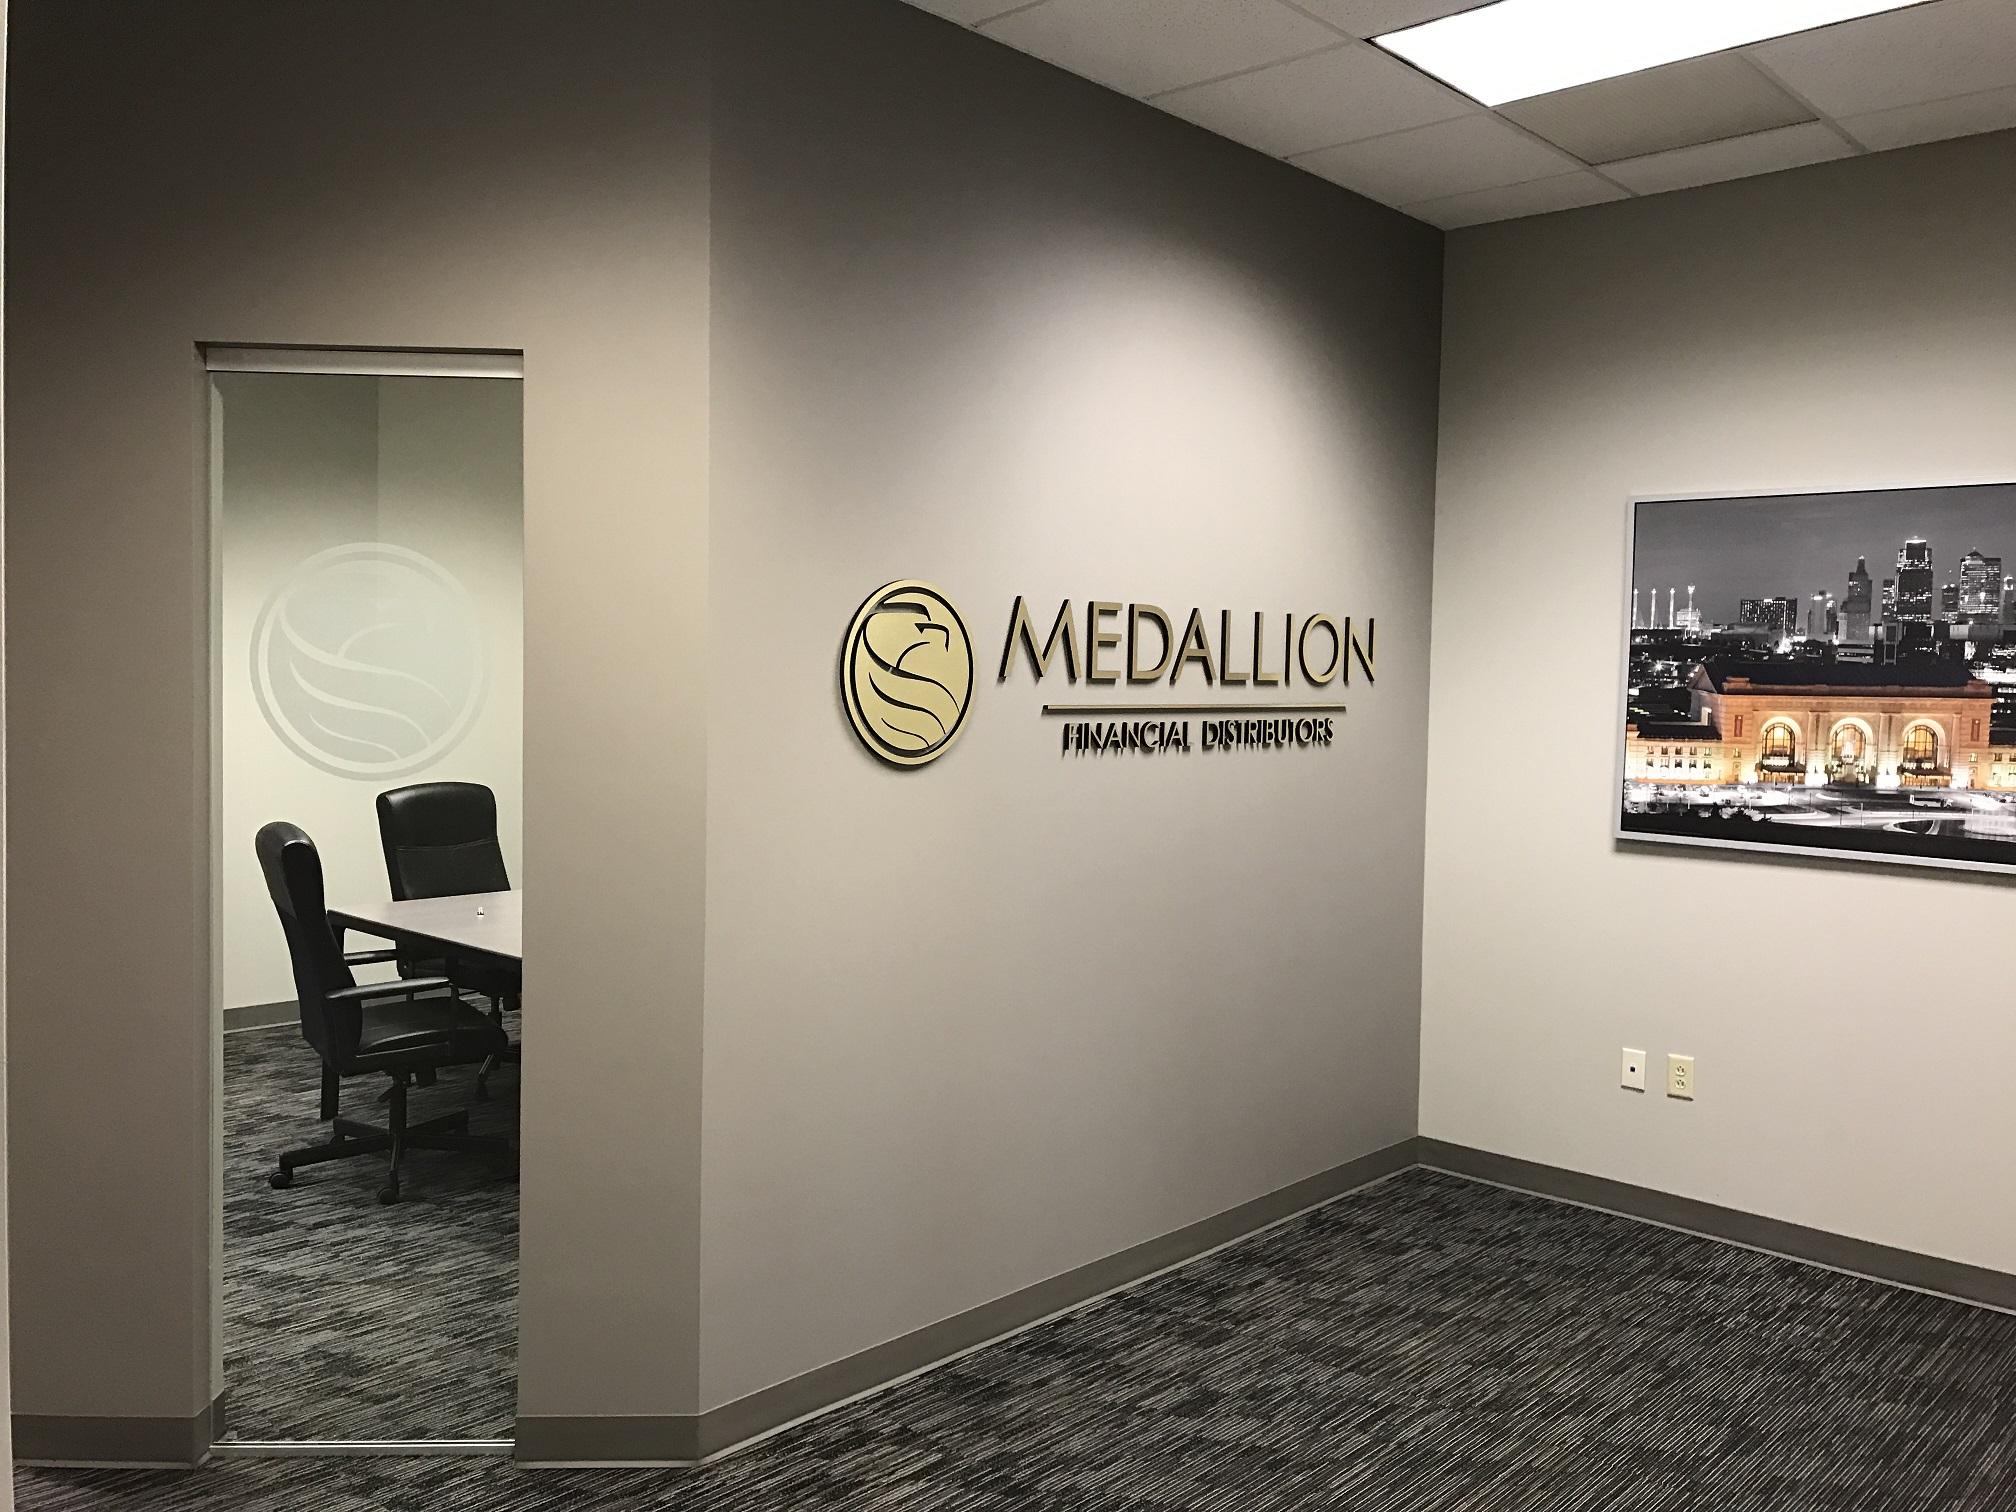 Medallion Financial Distributor Lobby Sign And Window Frost Logos - Medallion flooring distributor